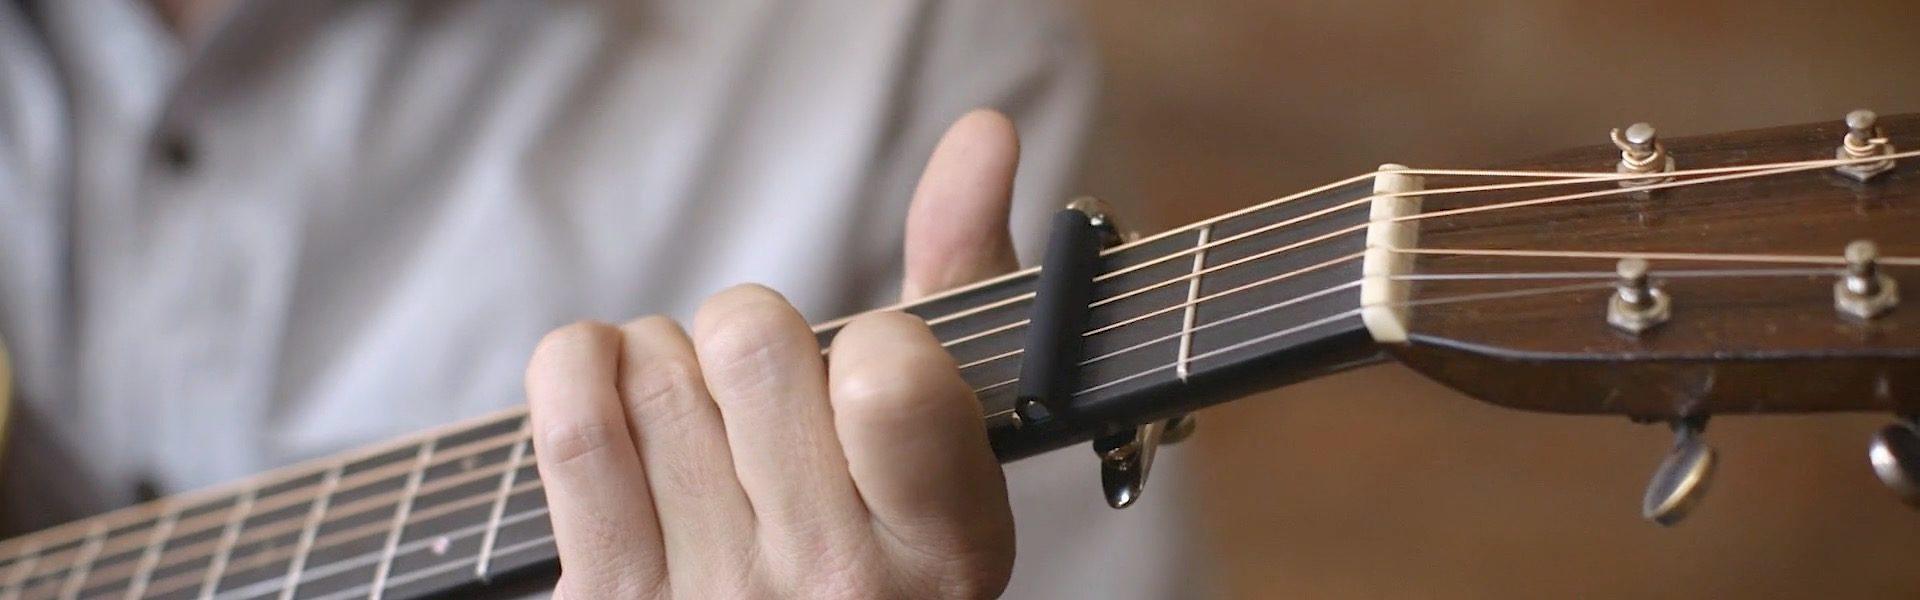 shubb-capo-guitar-2